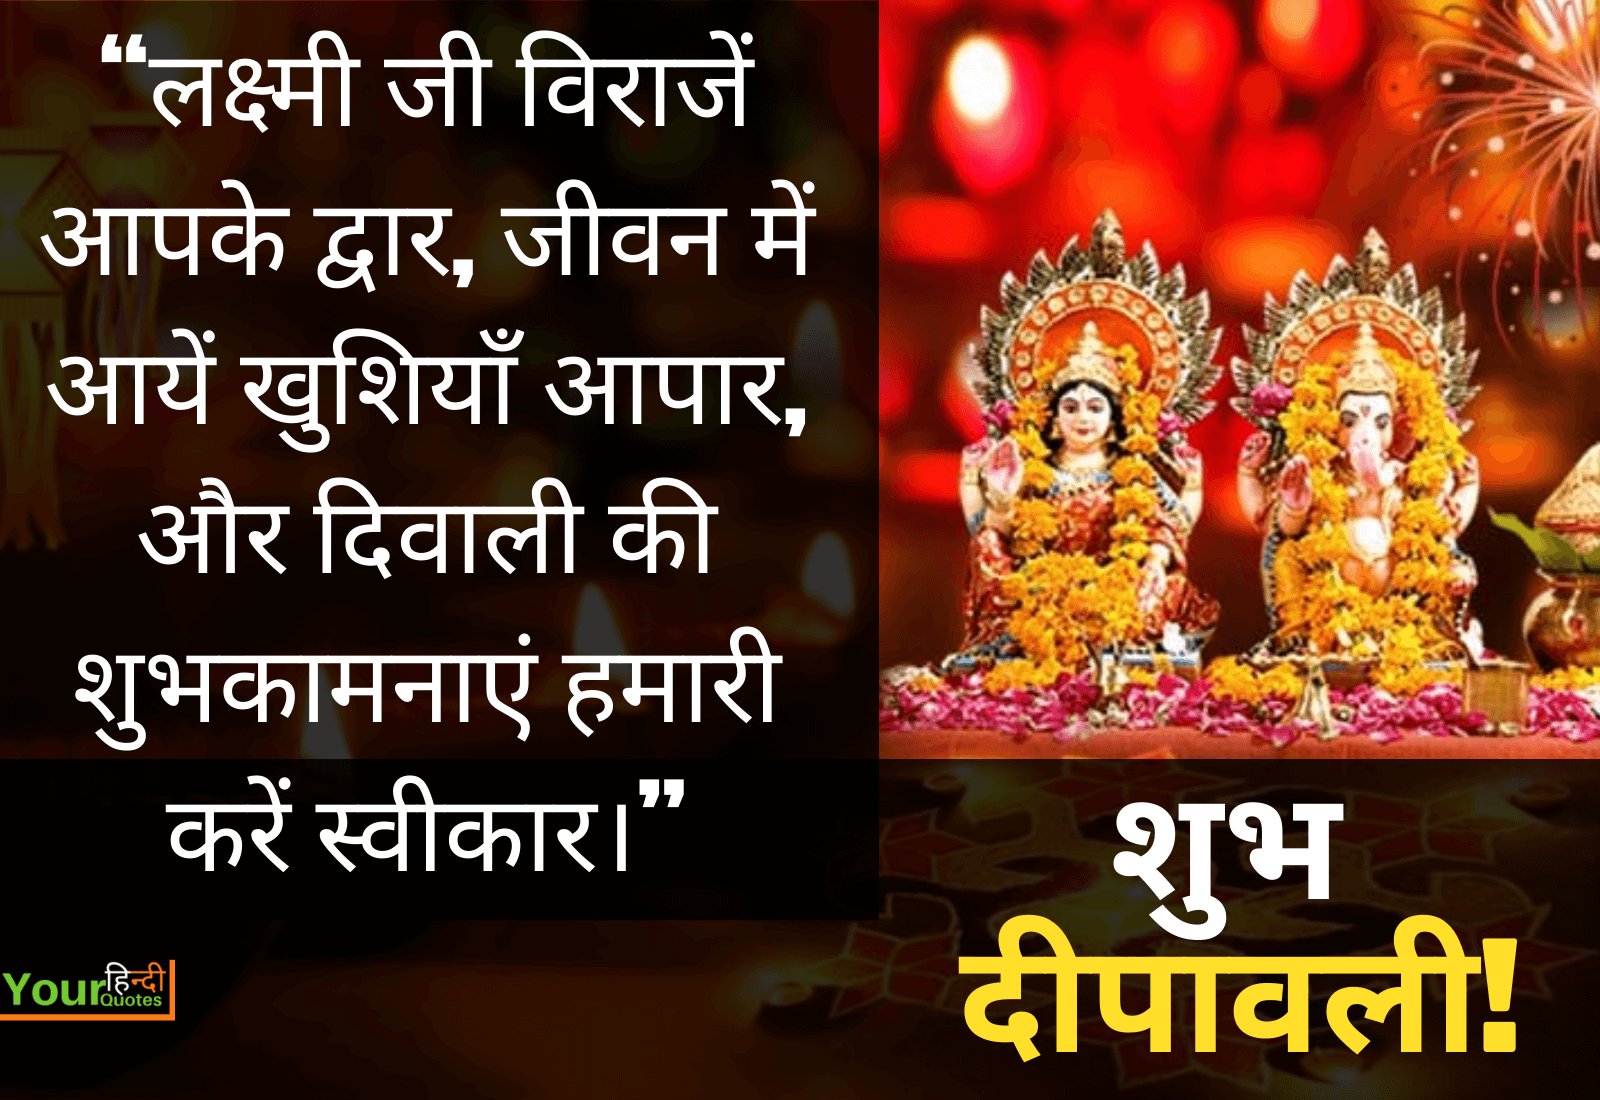 Diwali Wishes Hindi Images